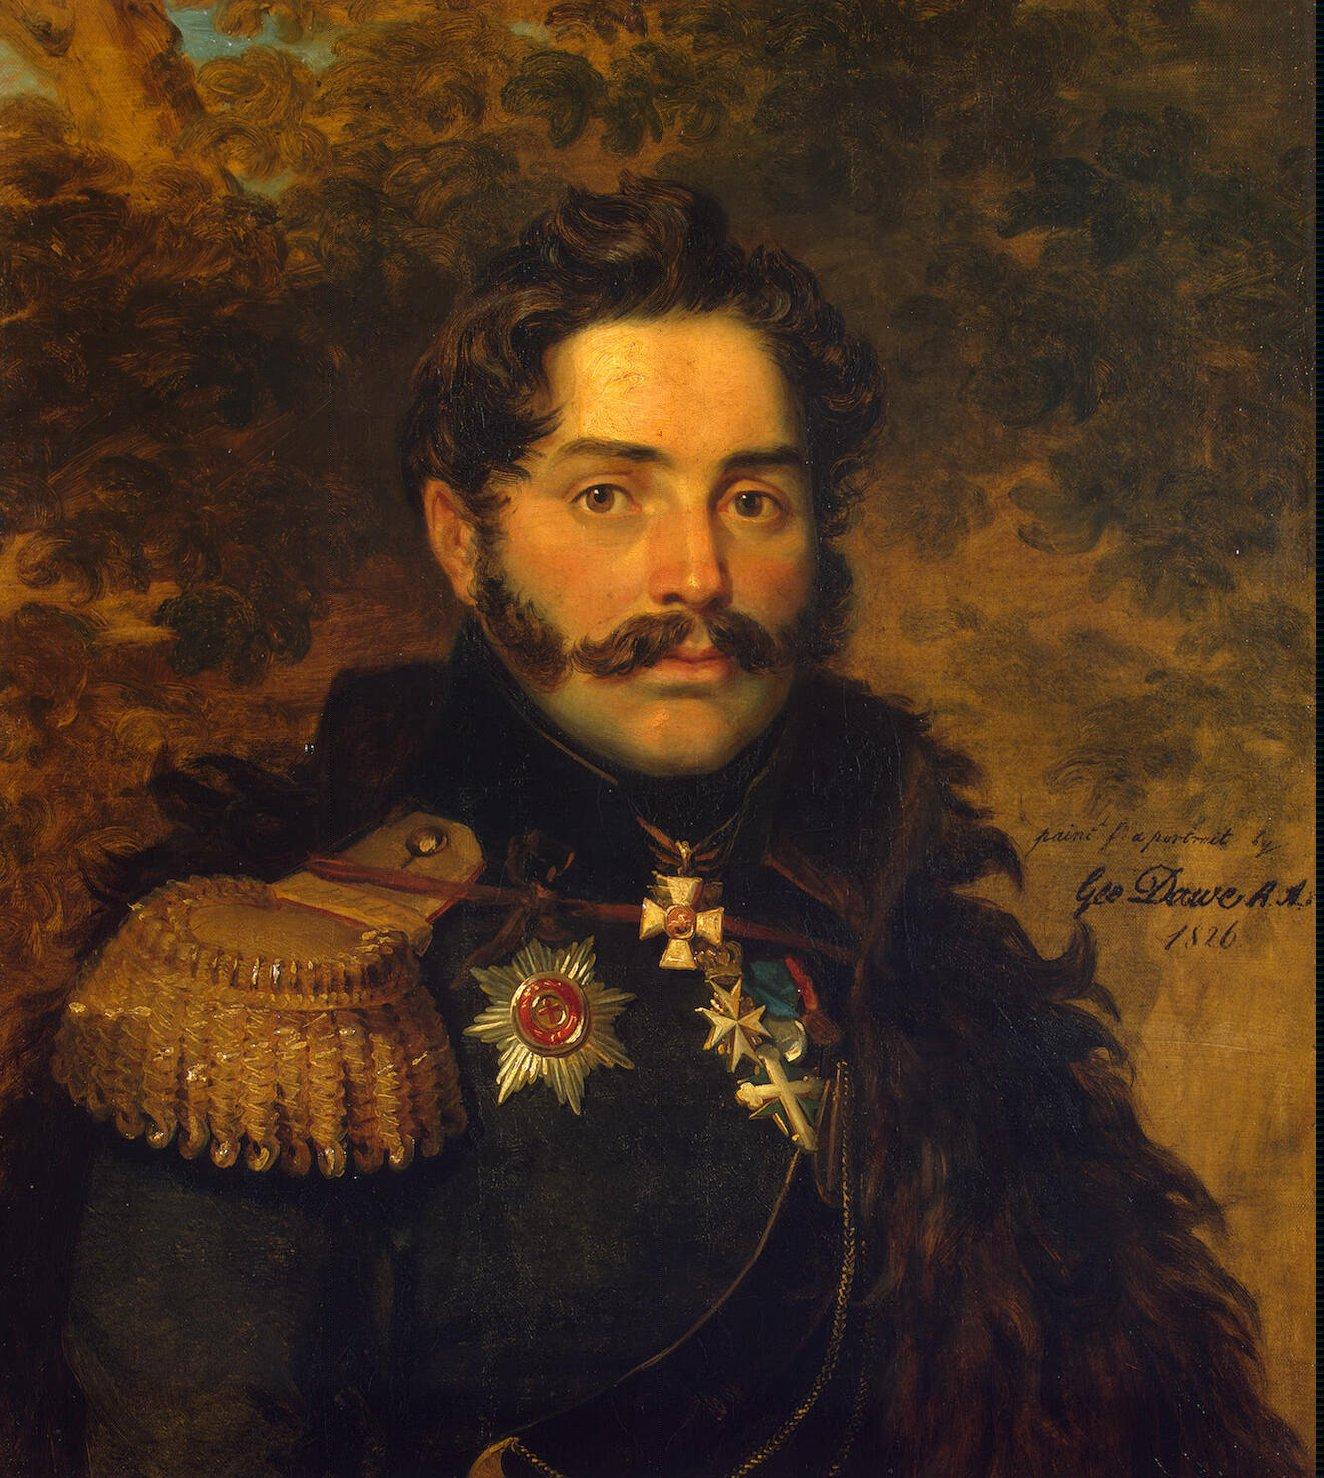 Щербатов, Александр Фёдорович